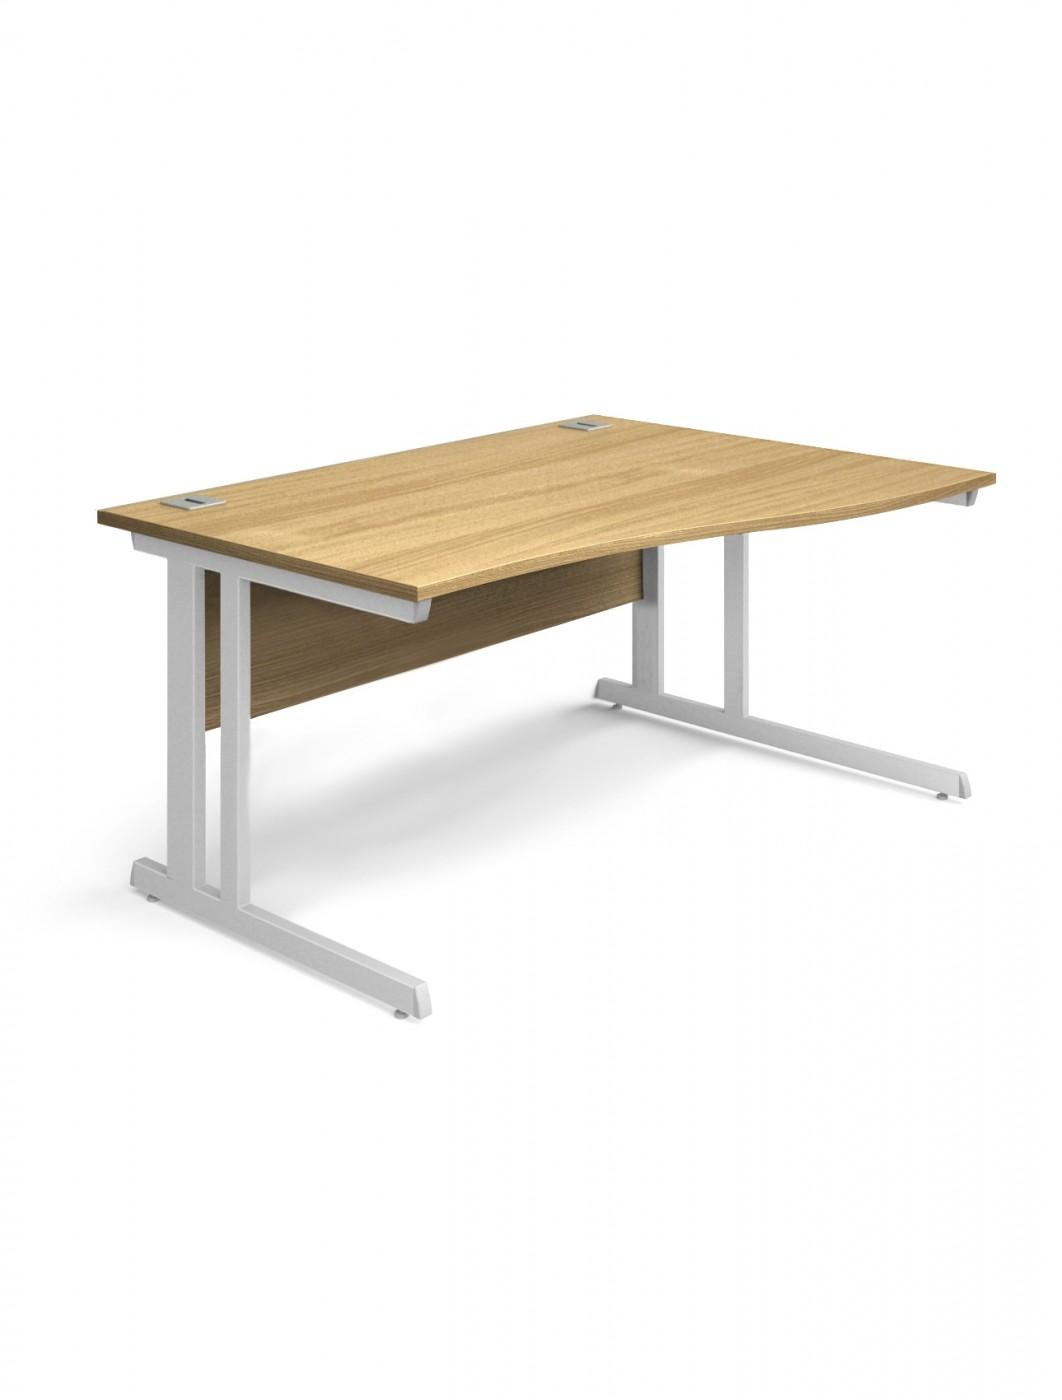 Oak office desk 1400mm aspire wave desk et wv 1400 rl ok 121 office furniture - Oak office desk ...